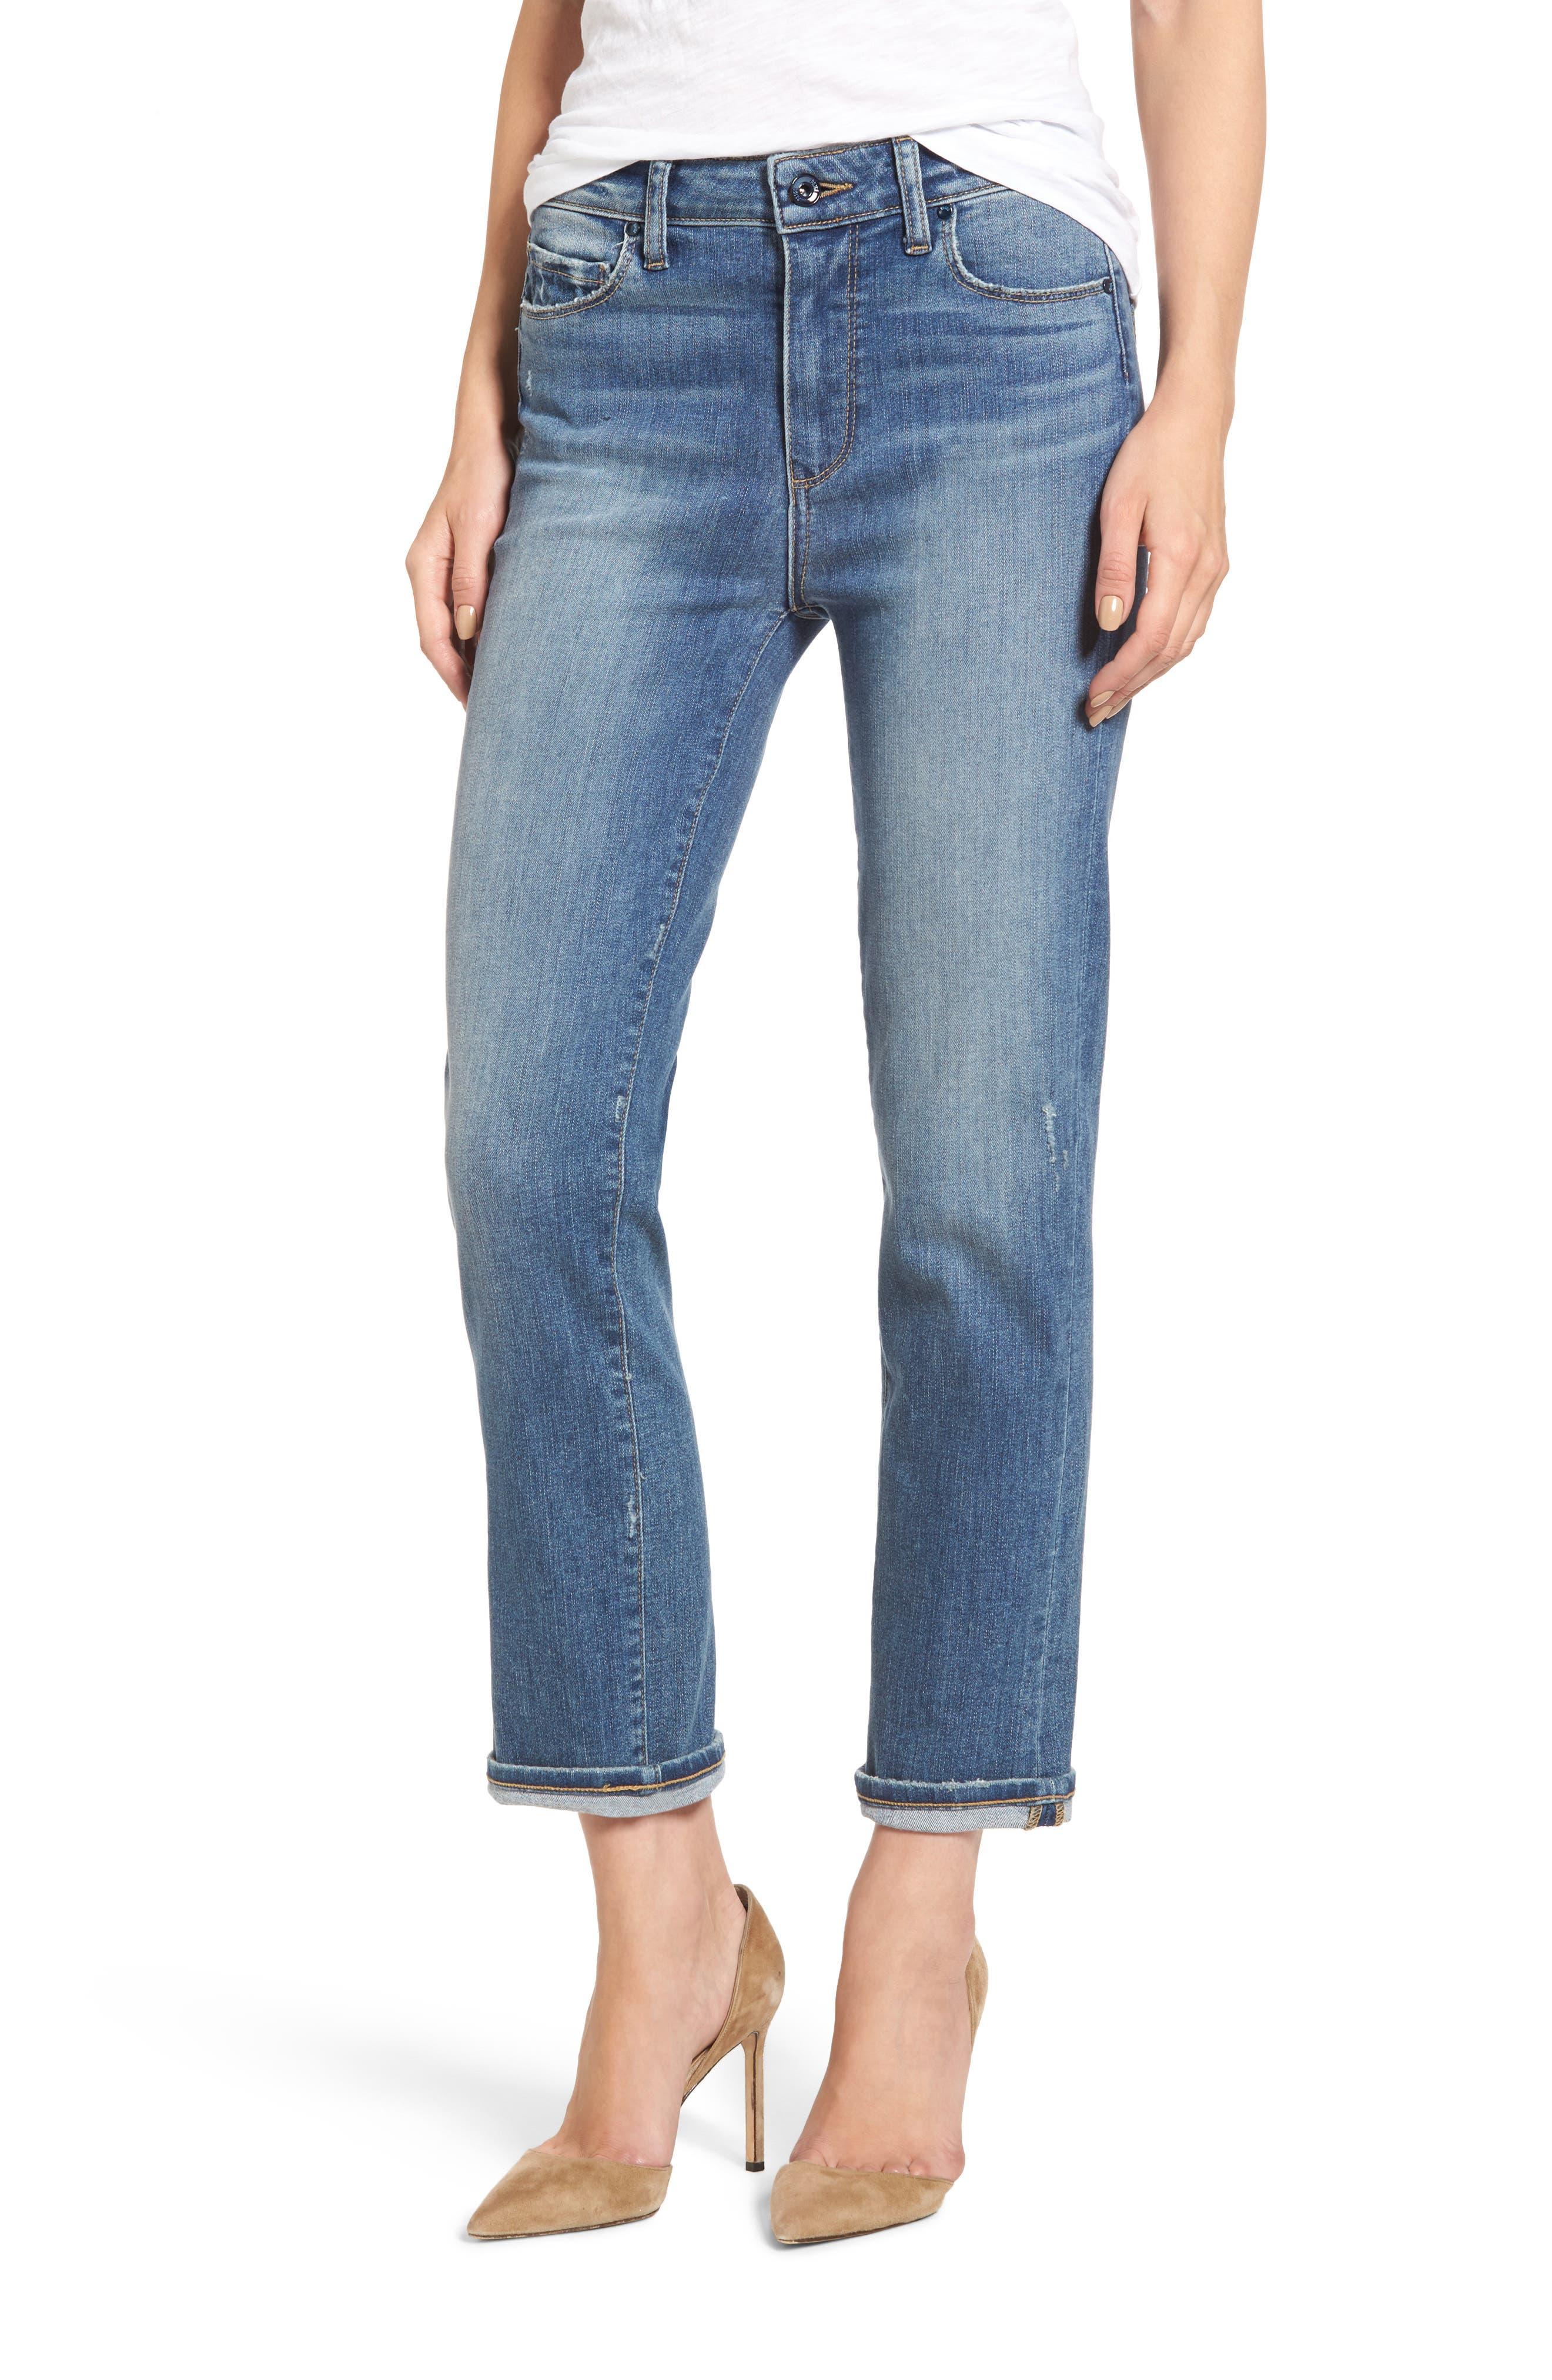 Main Image - PAIGE Transcend Vintage - Jacqueline High Waist Ankle Straight Leg Jeans (Sienna)